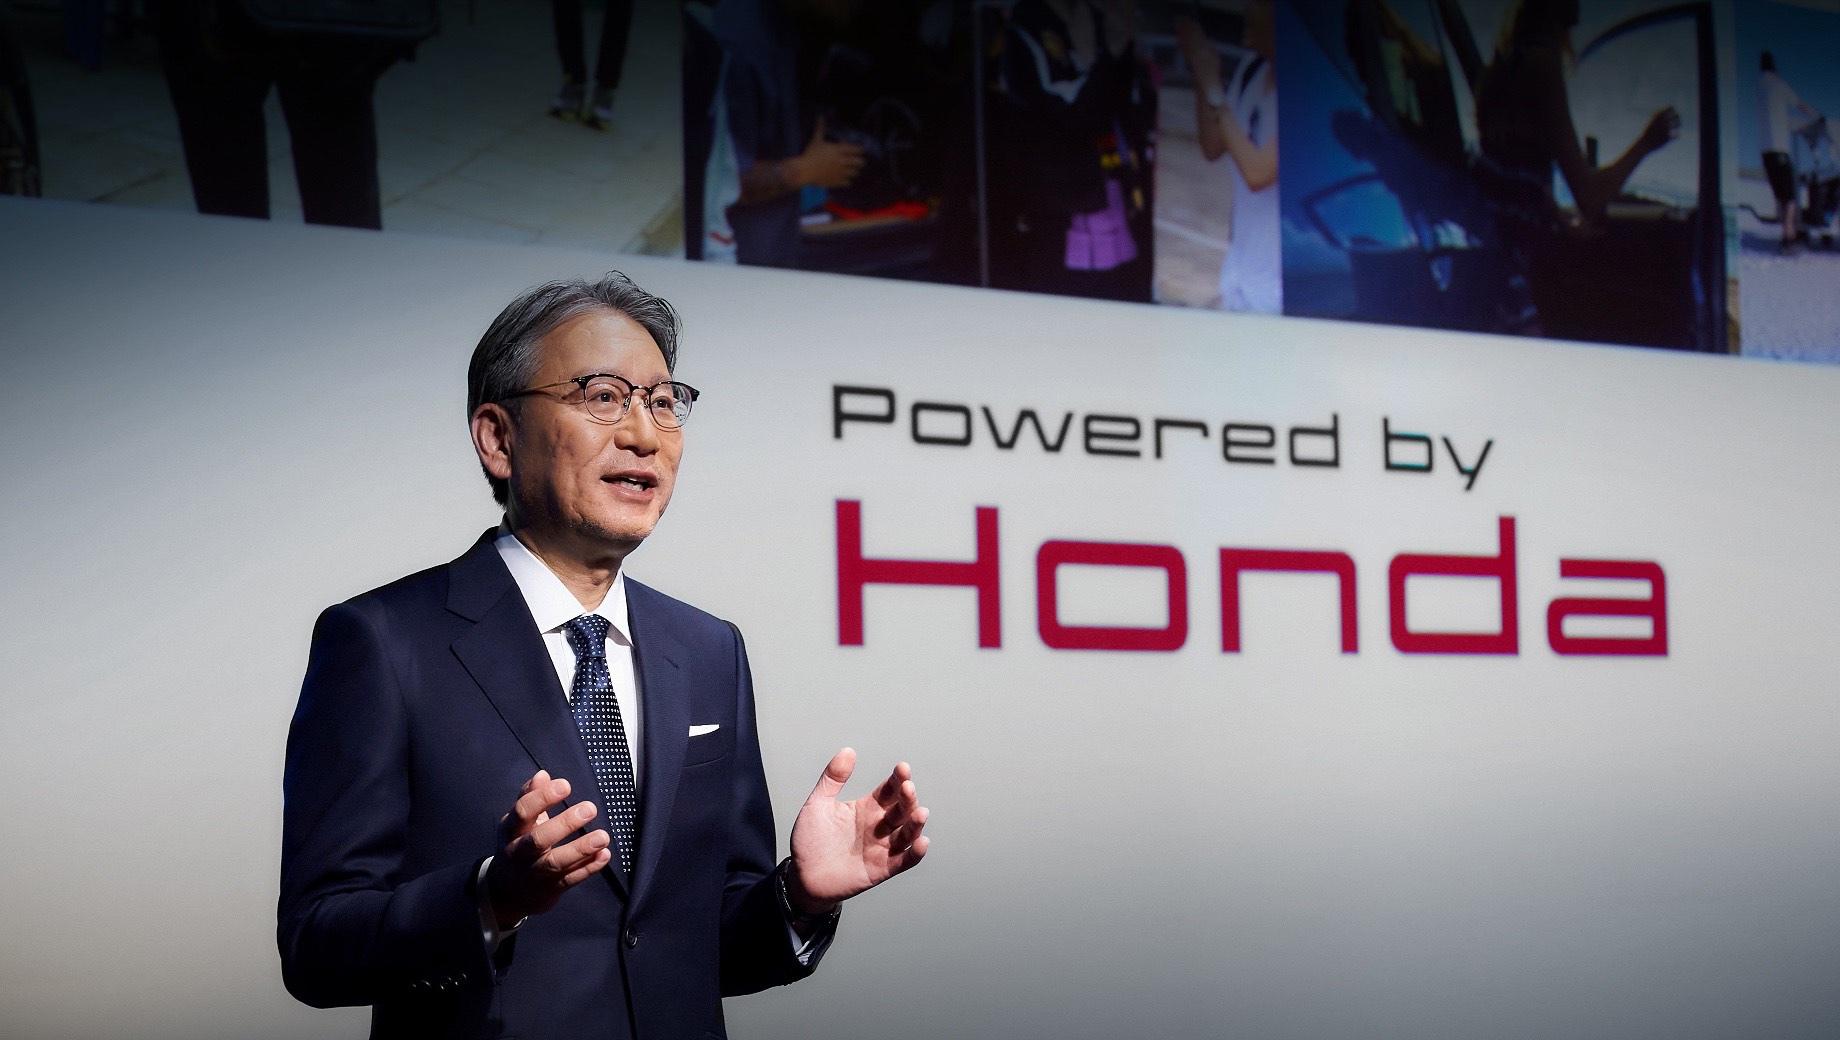 Honda назначила полную электрификацию на 2040 год